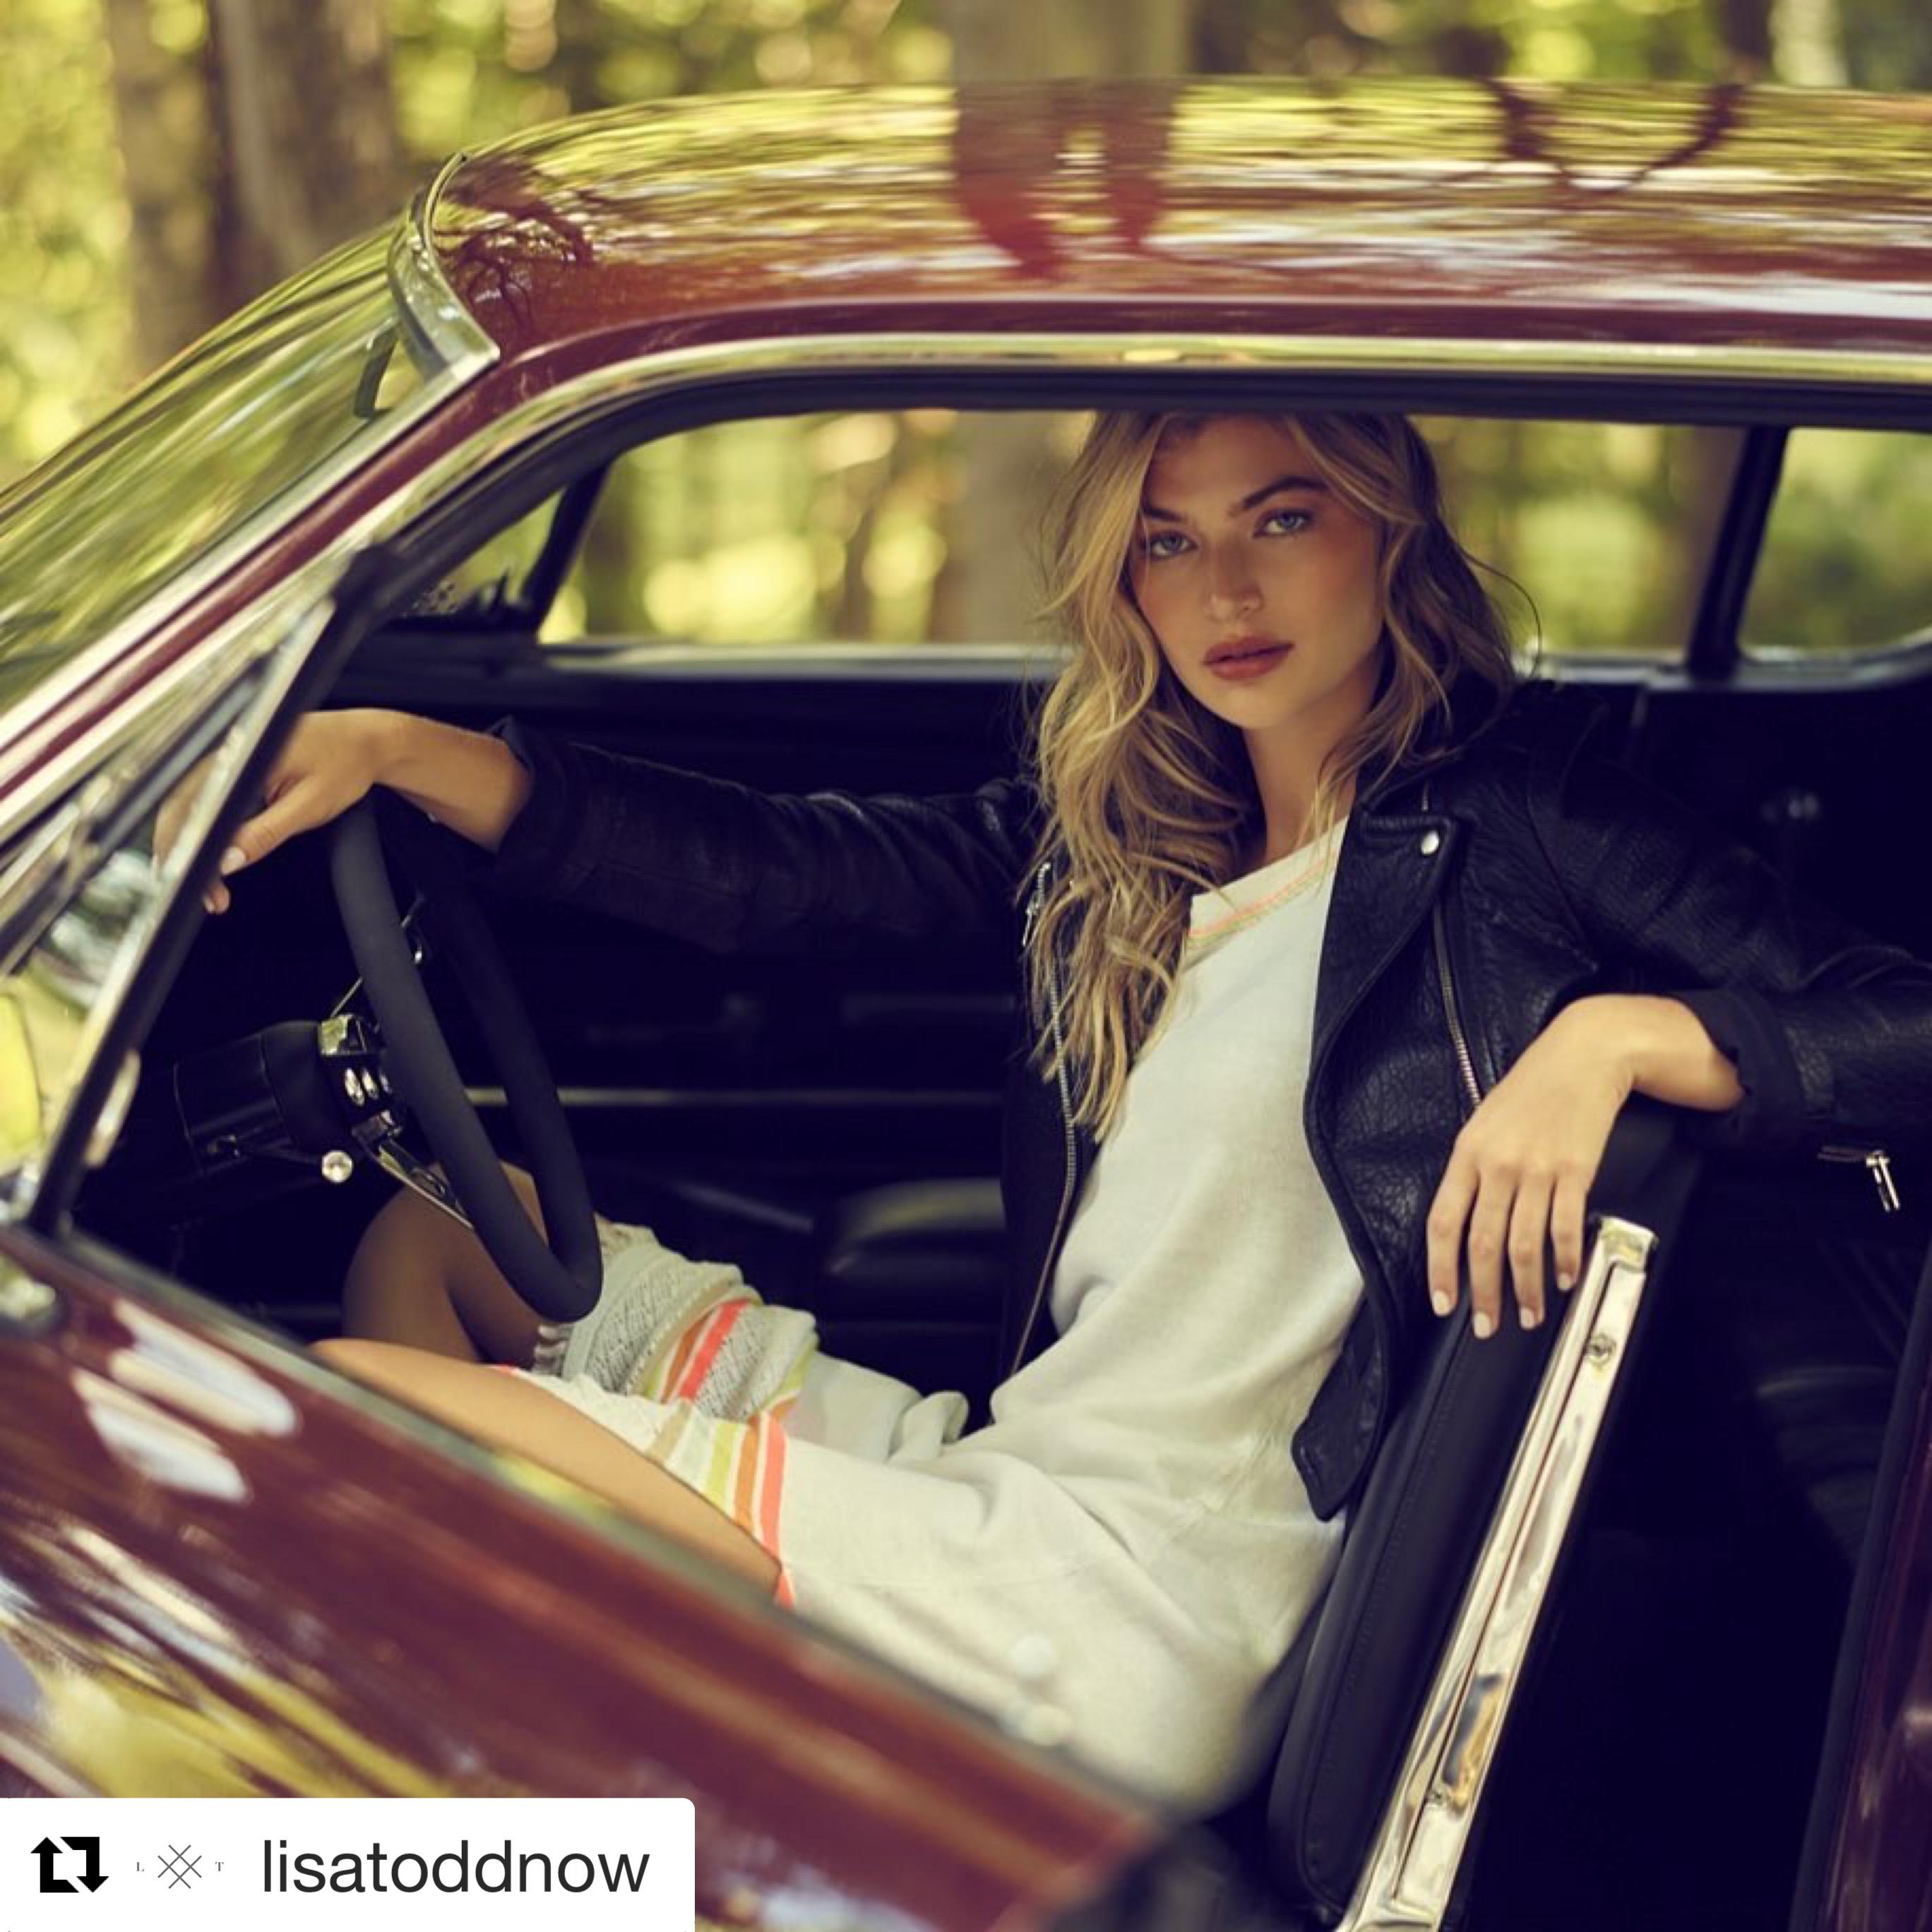 Lisa Todd Dress - Riviera Sunny Combo